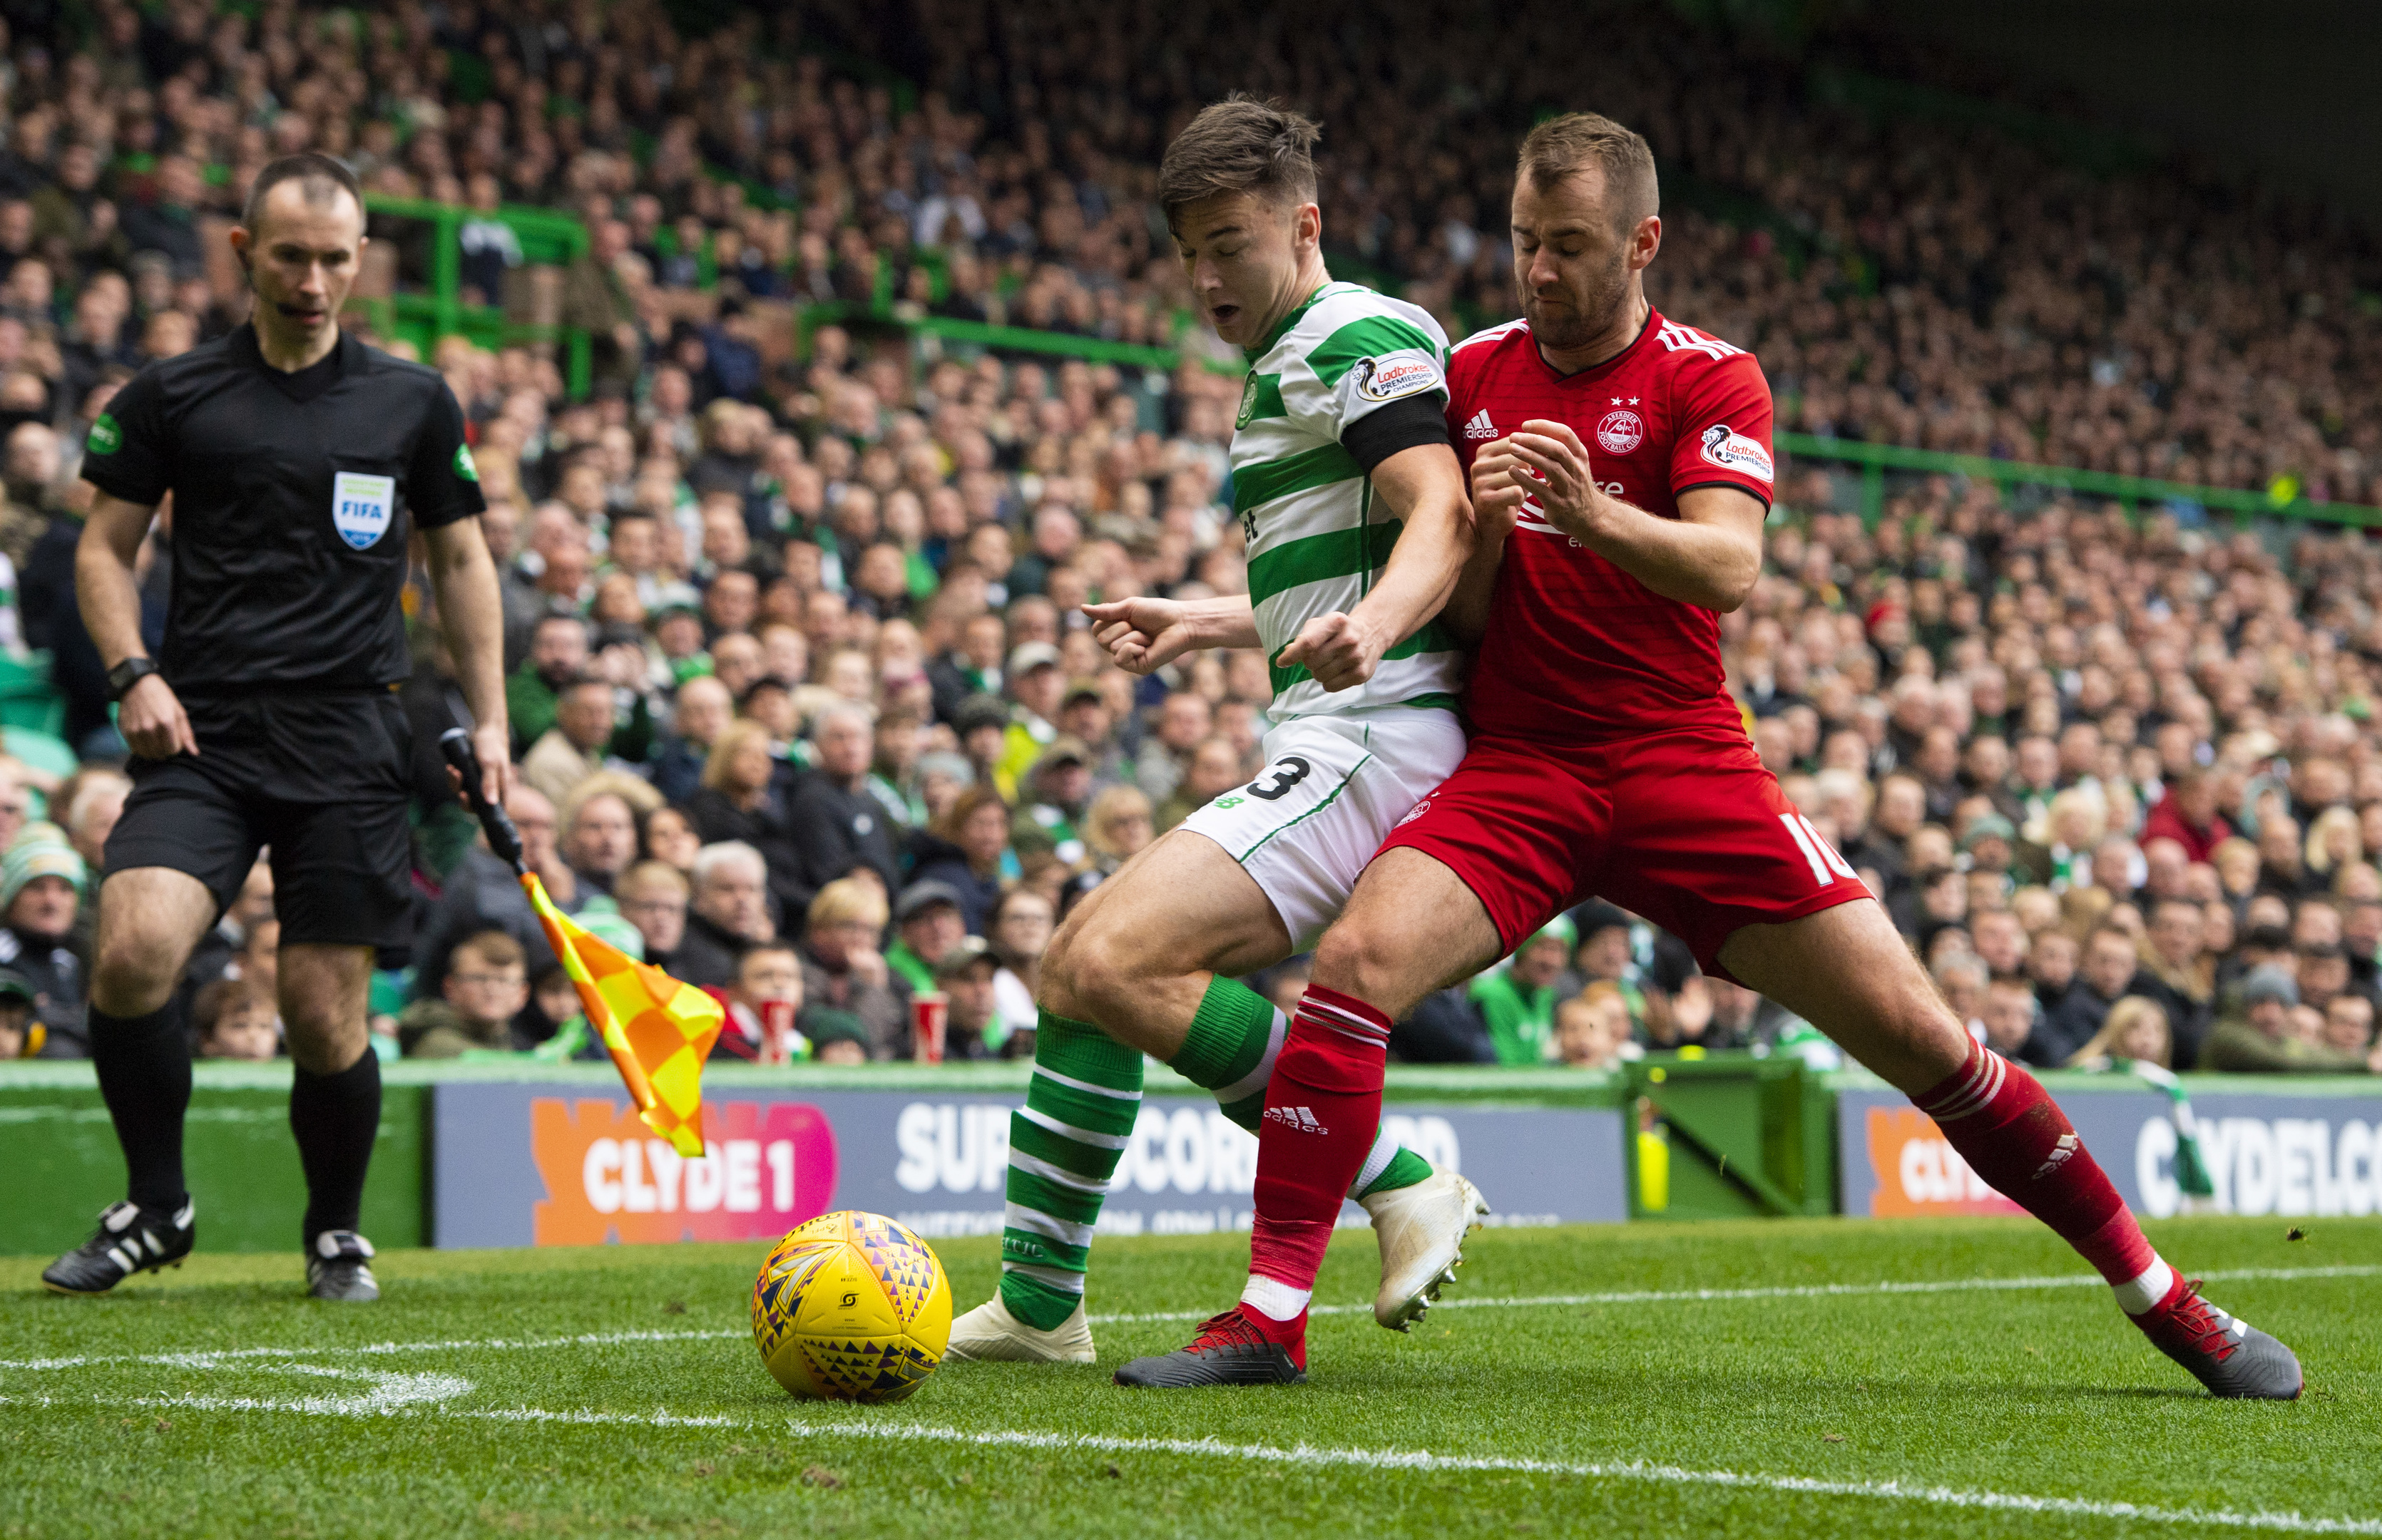 Celtic's Kieran Tierney (left) holds off Aberdeen's Niall McGinn